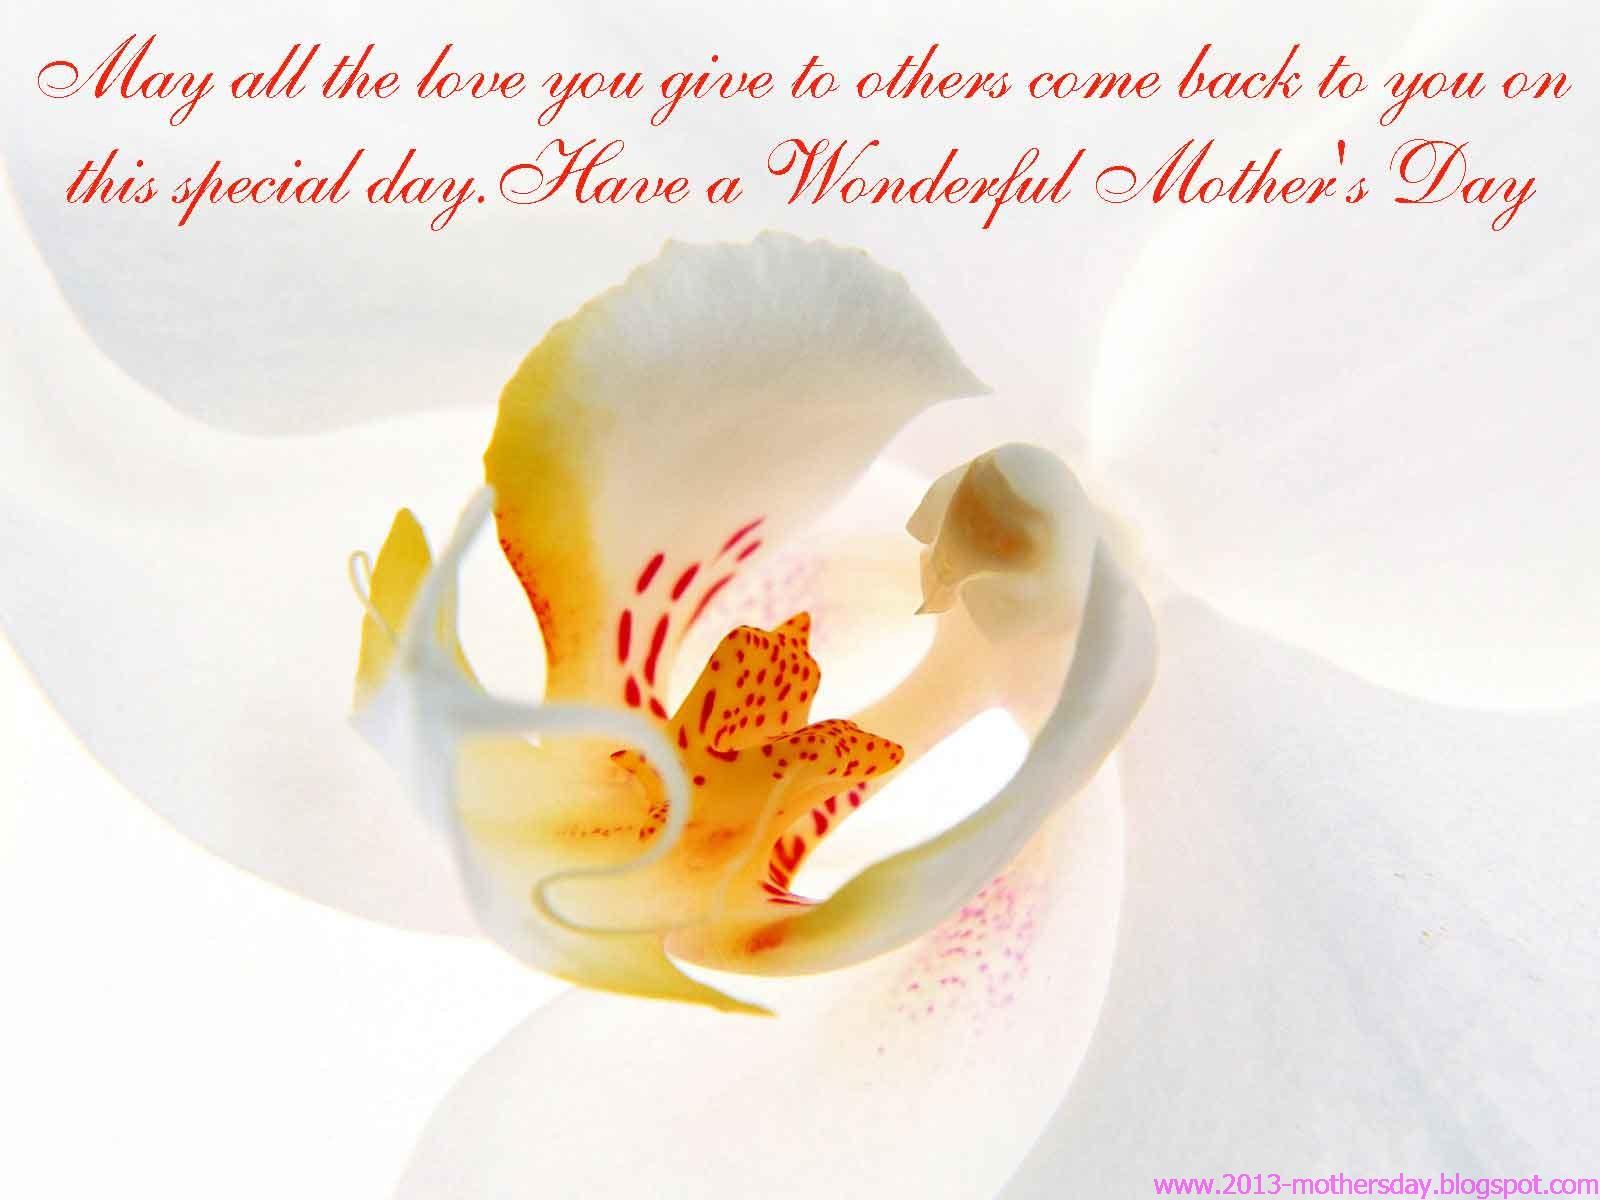 http://4.bp.blogspot.com/-iR52WwX128Q/USnHN89QaJI/AAAAAAAAEwo/9RfyHrhtyhk/s1600/Mothers-Day-Wishes-Wallpaper.jpg